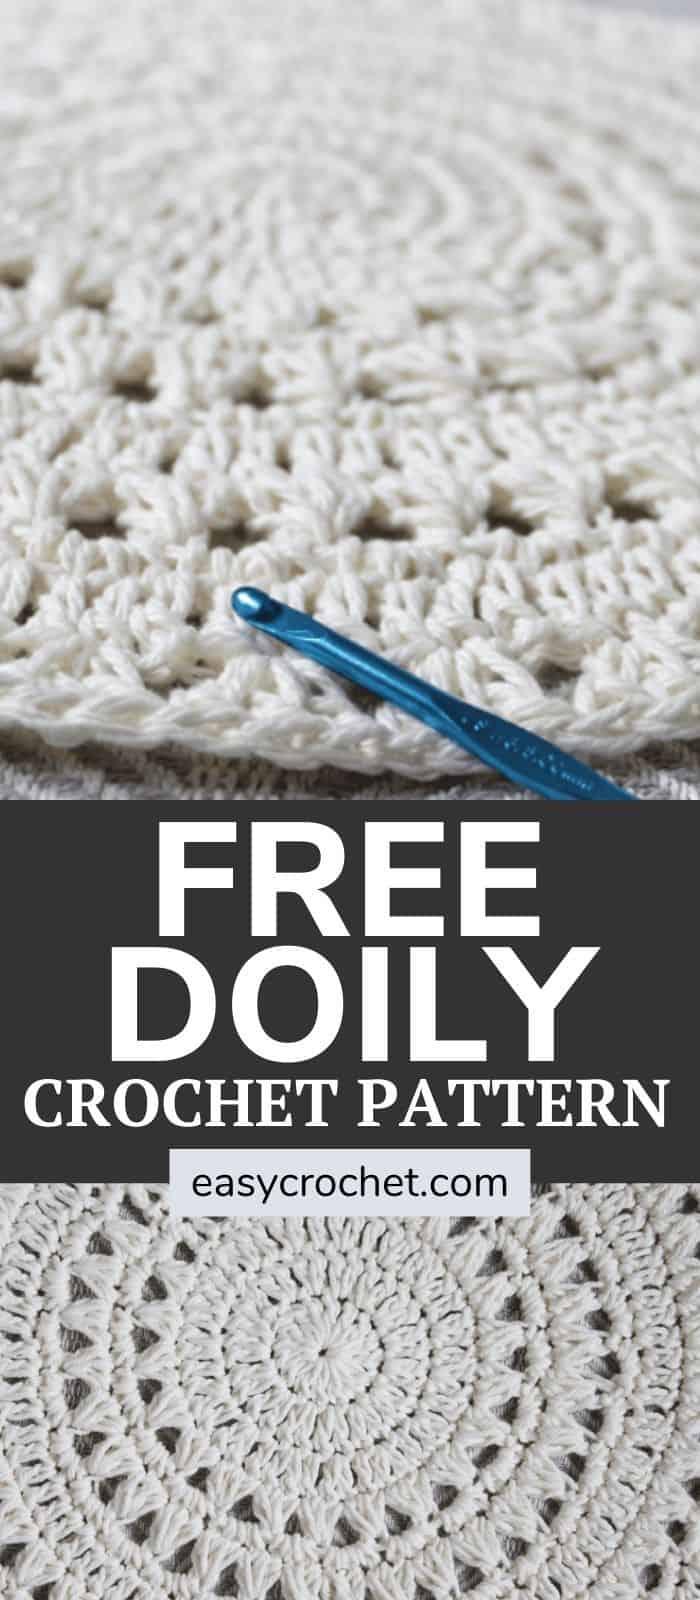 Free Doily Crochet Pattern by Easy Crochet via @easycrochetcom